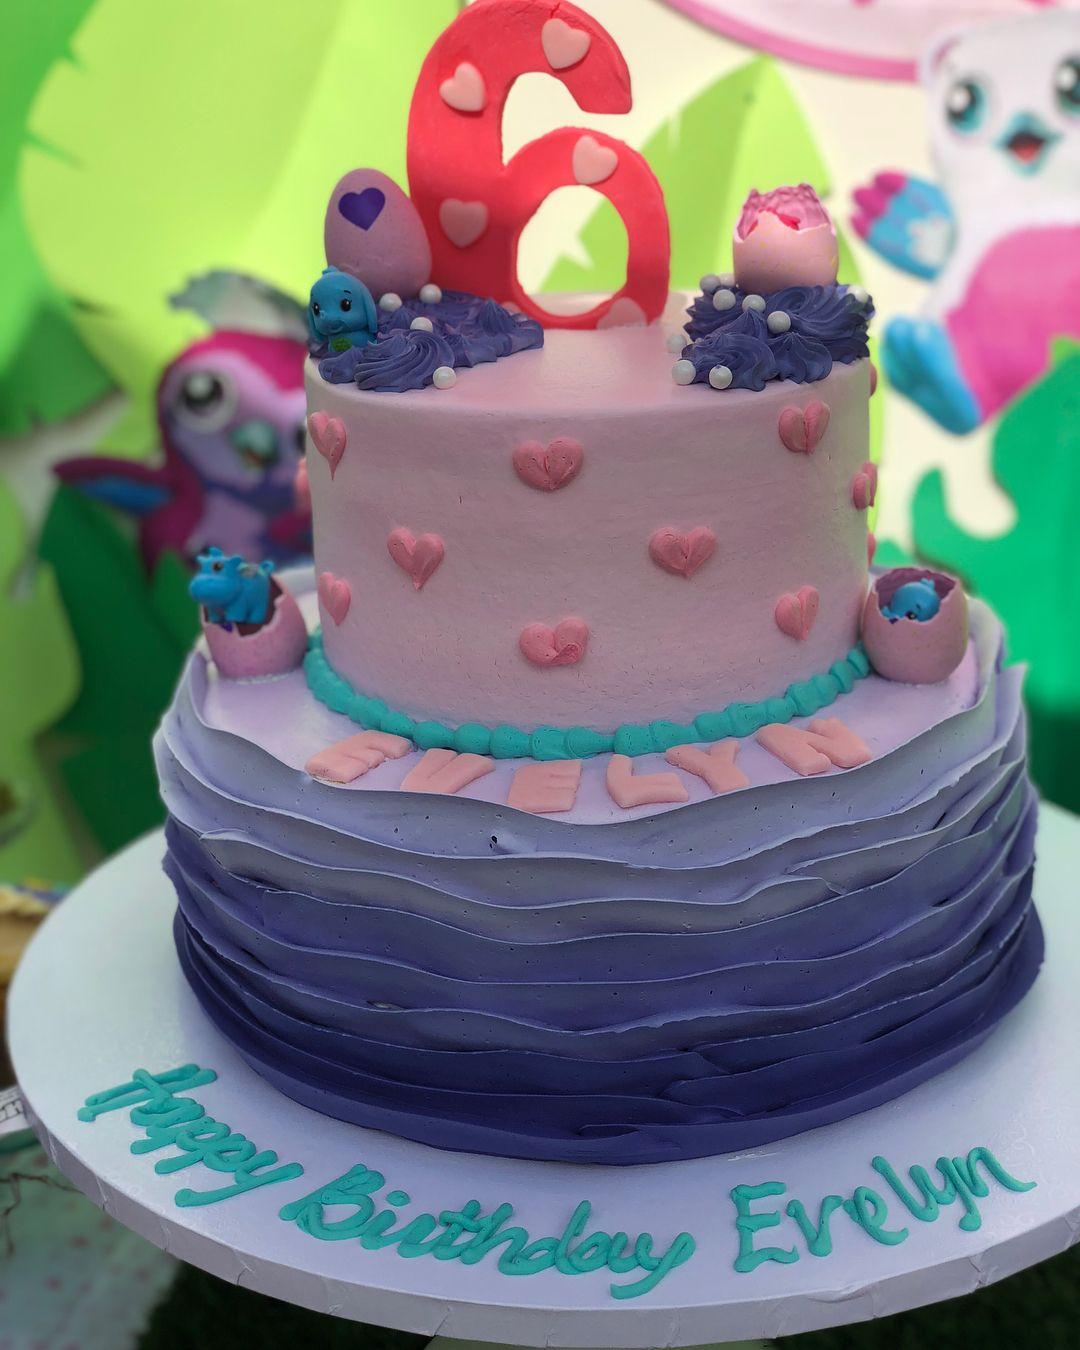 Hatchimal Birthday Cake